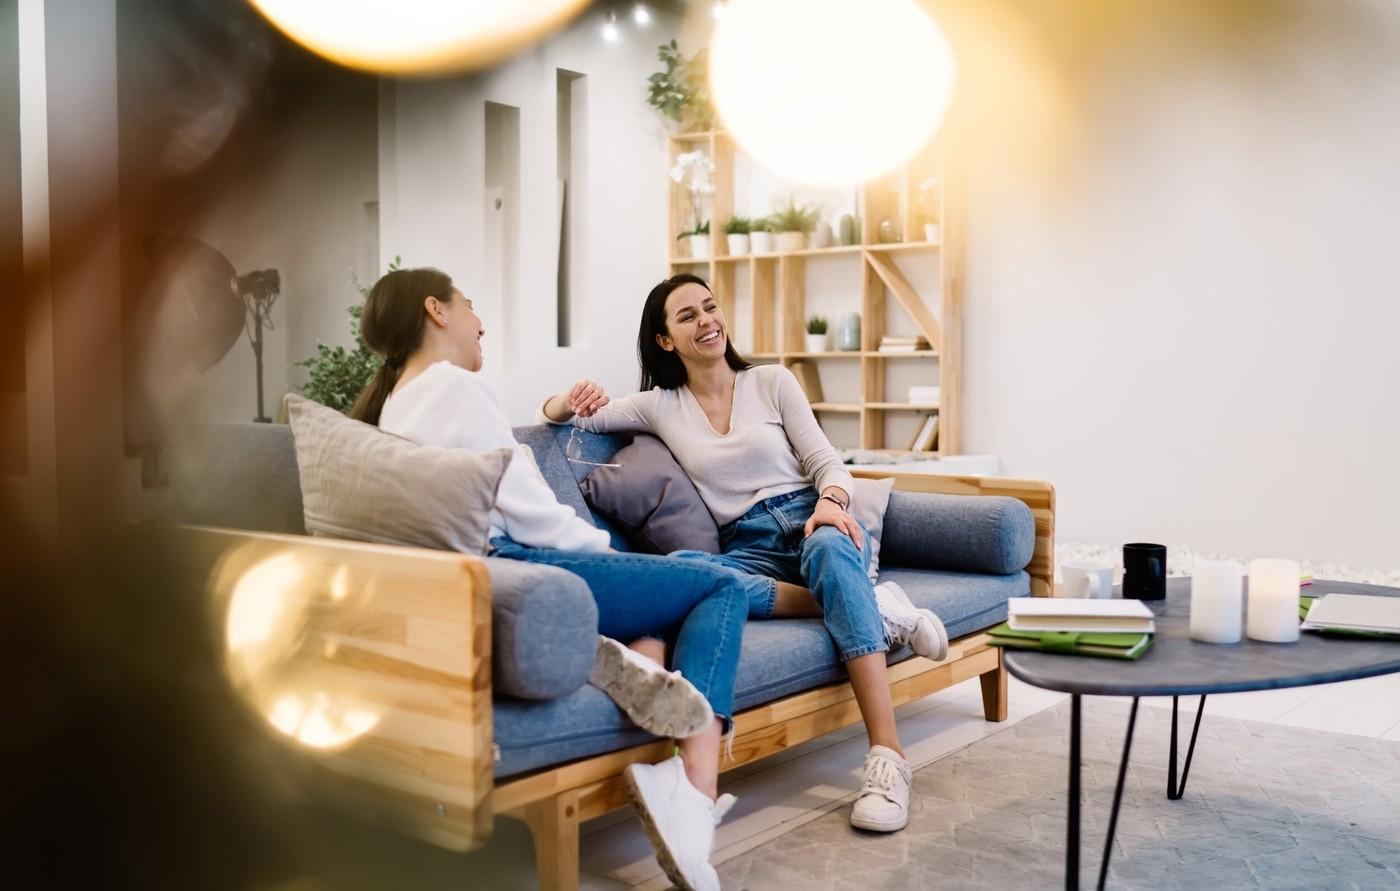 Conversation on Sofa